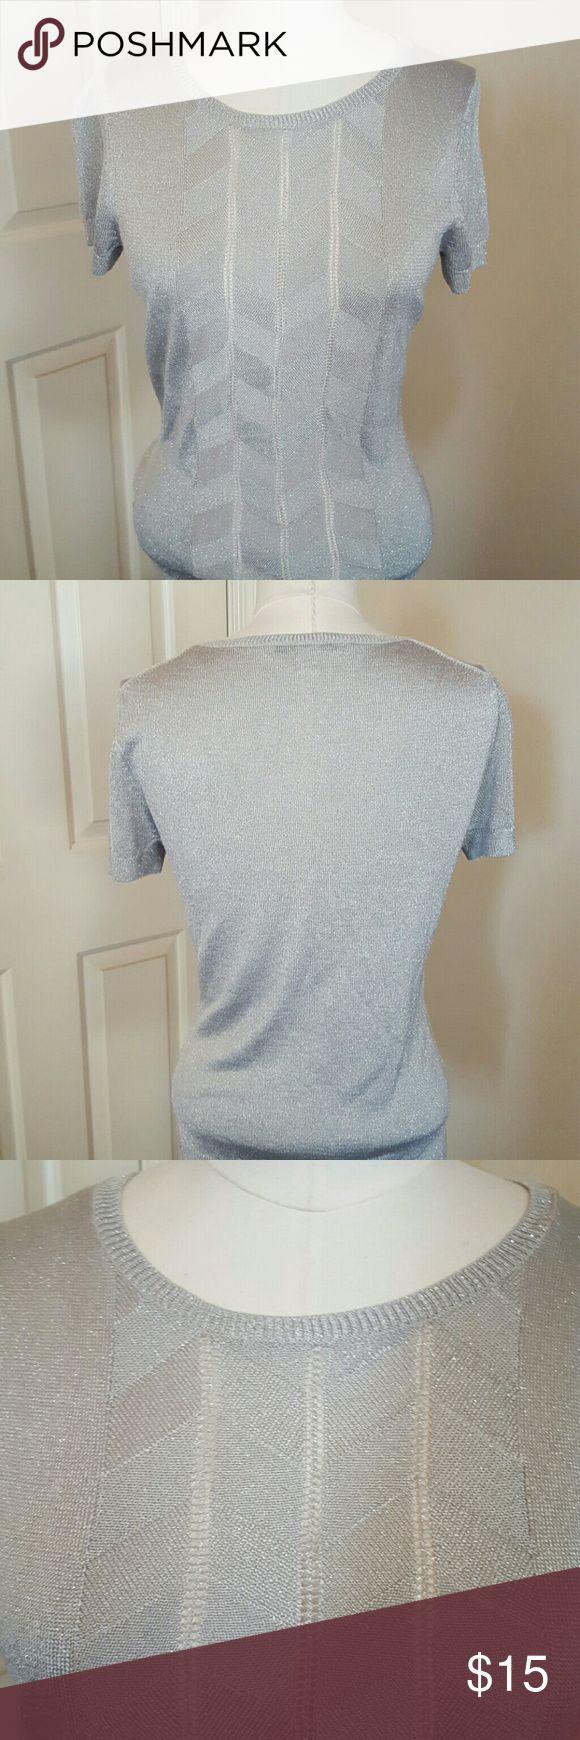 Metallic silver short sleeve knit top Light gray metallic lightweight sweater.  Chevron pattern detail in fabric, down center of the top. Banana Republic Tops